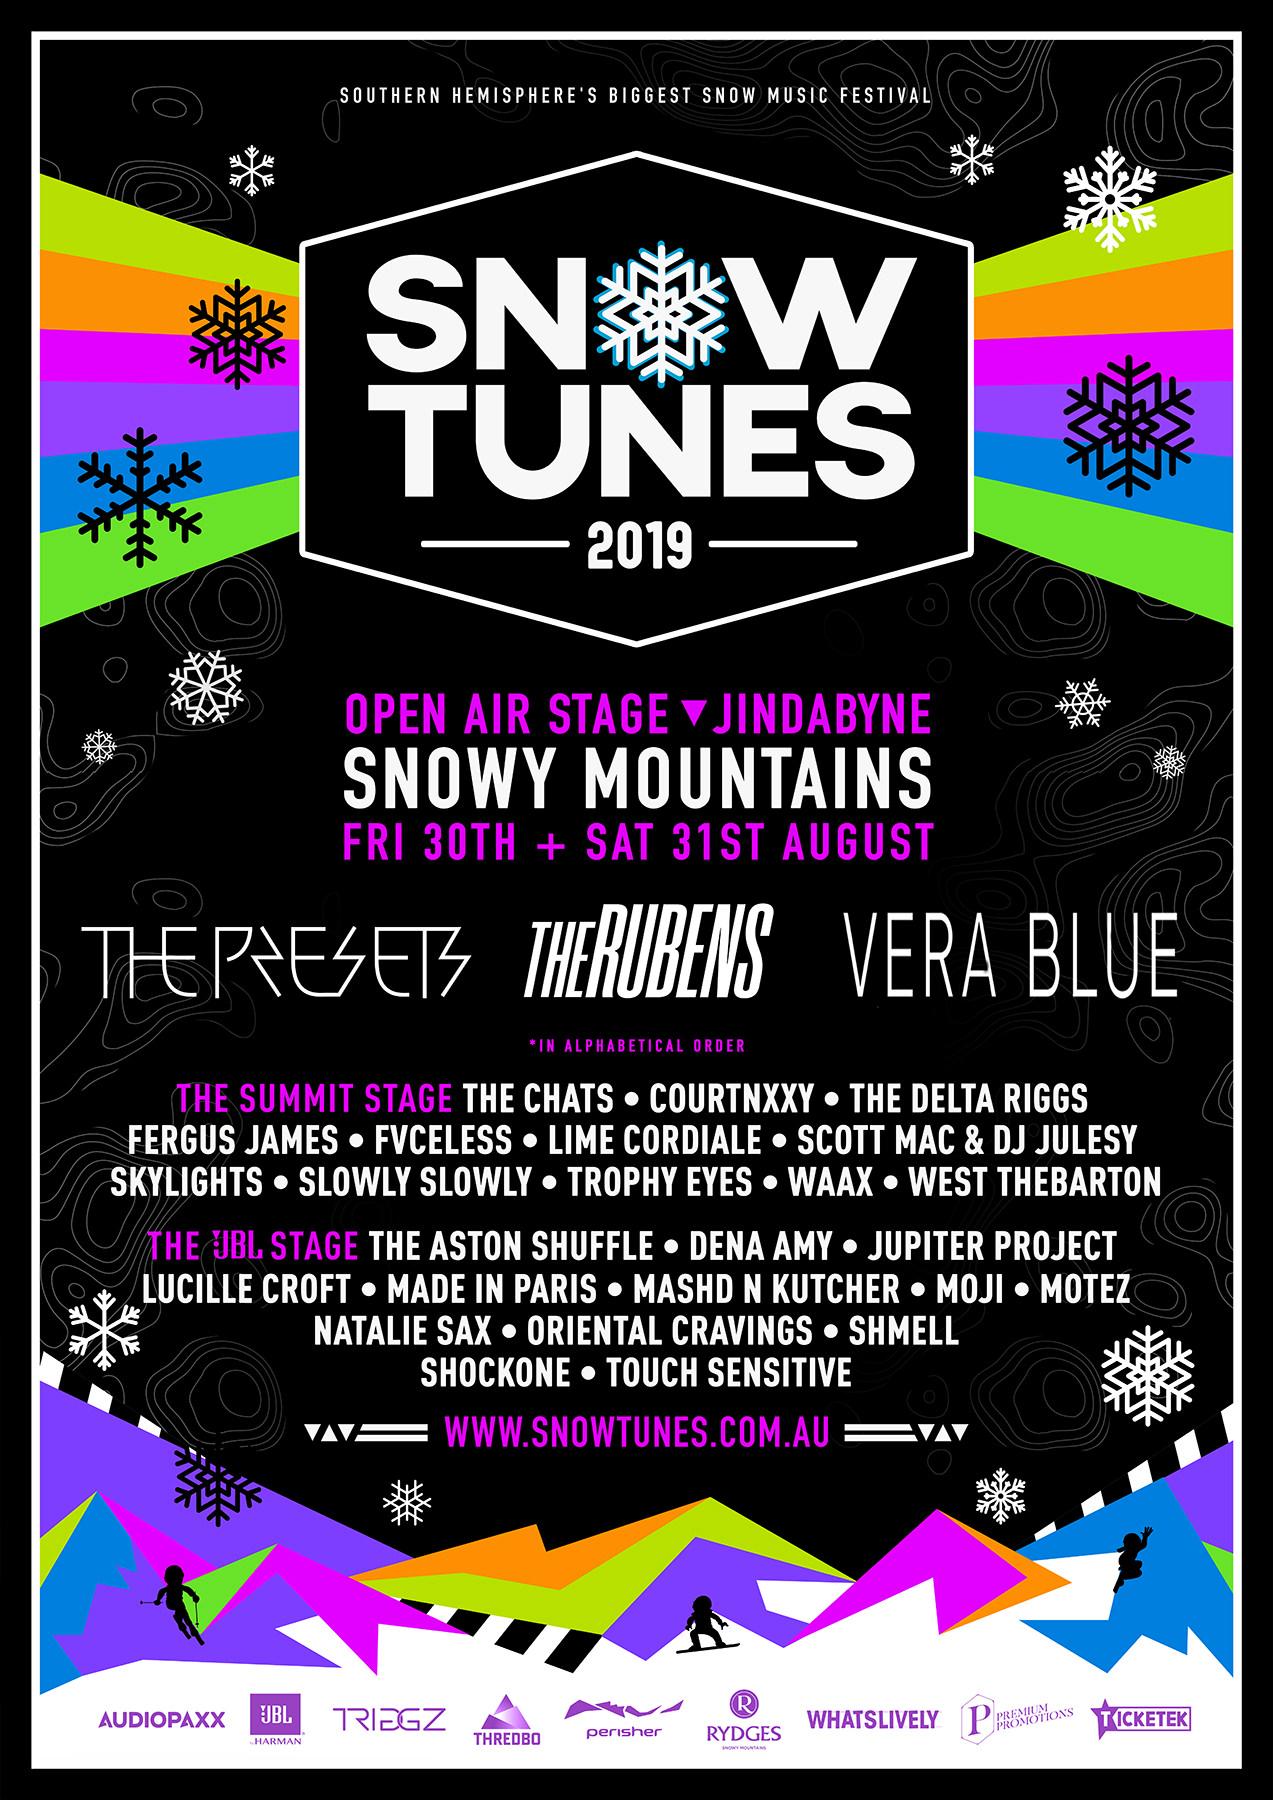 snow-tunes-2019-lineup-australia-oz-edm